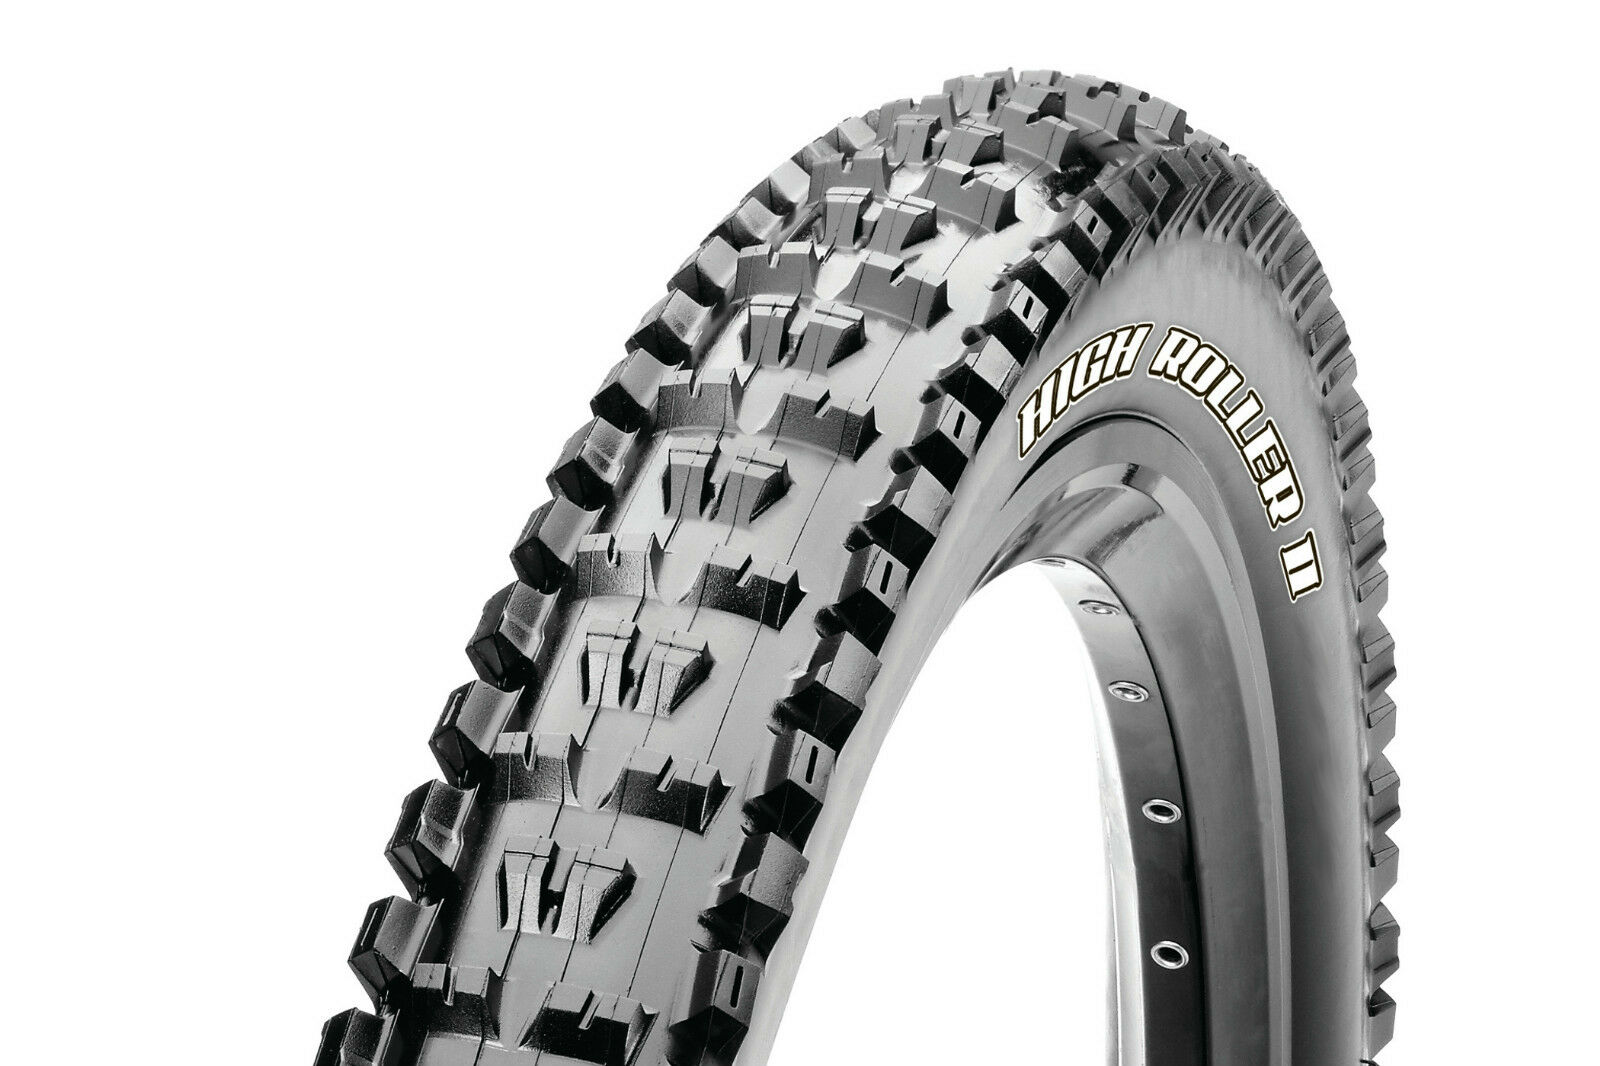 Tyre Maxxis HIGH ROLLER II 26x2,40 TPI60 3C Rigid inner tube TIRE MAXXI